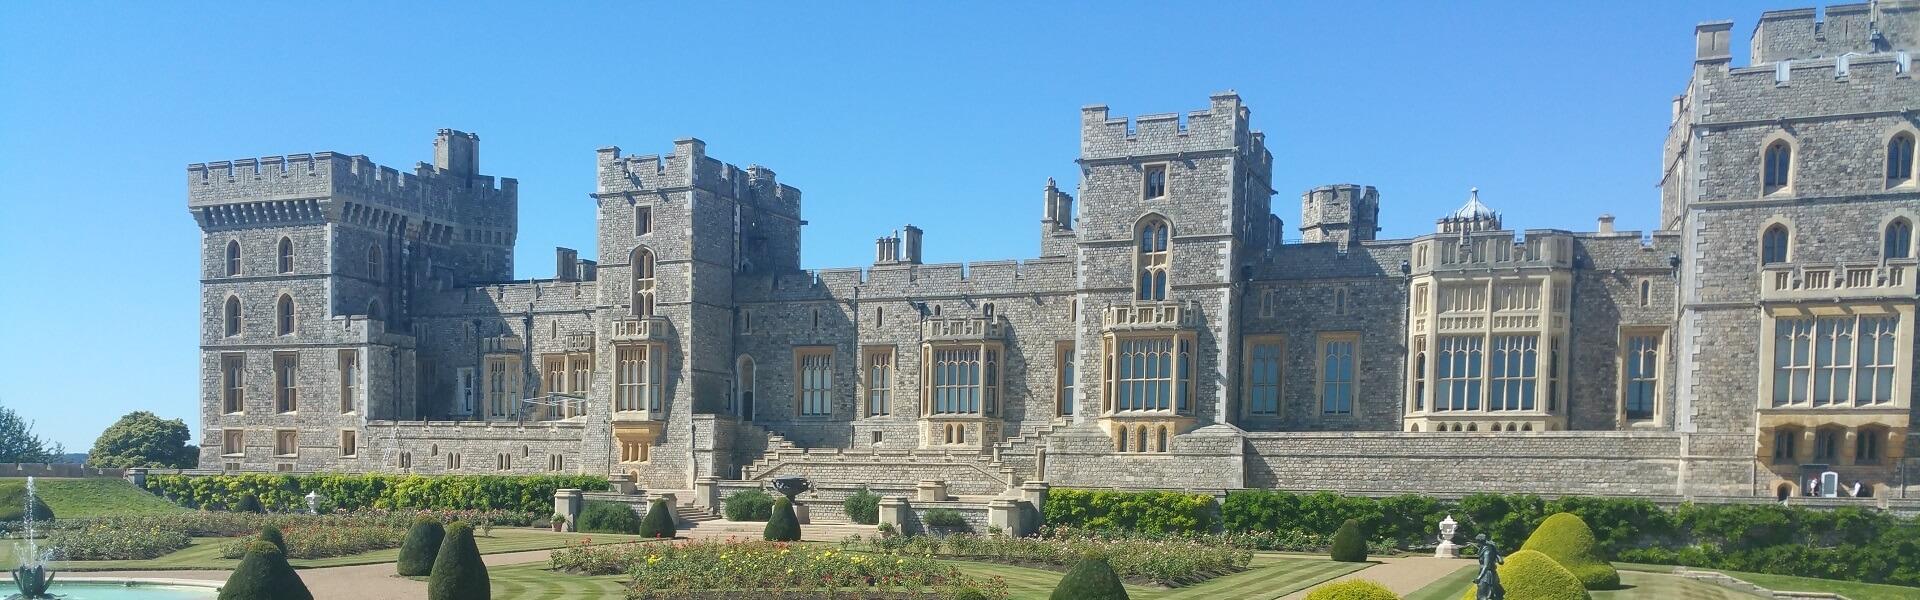 Windsorský hrad